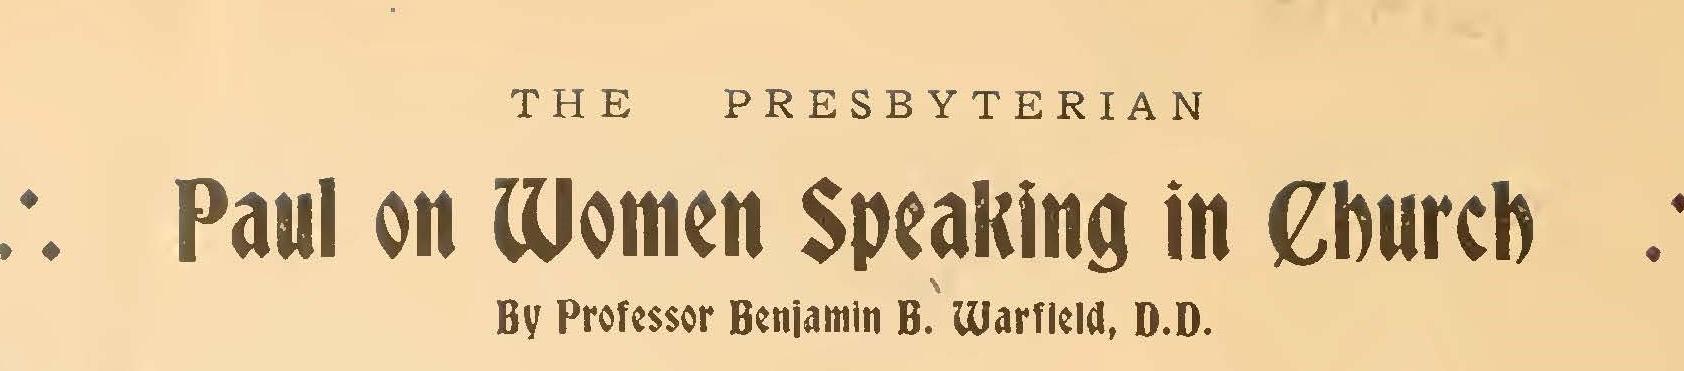 Warfield, Benjamin Breckinridge, Paul on Women Speaking in Church Title Page.jpg